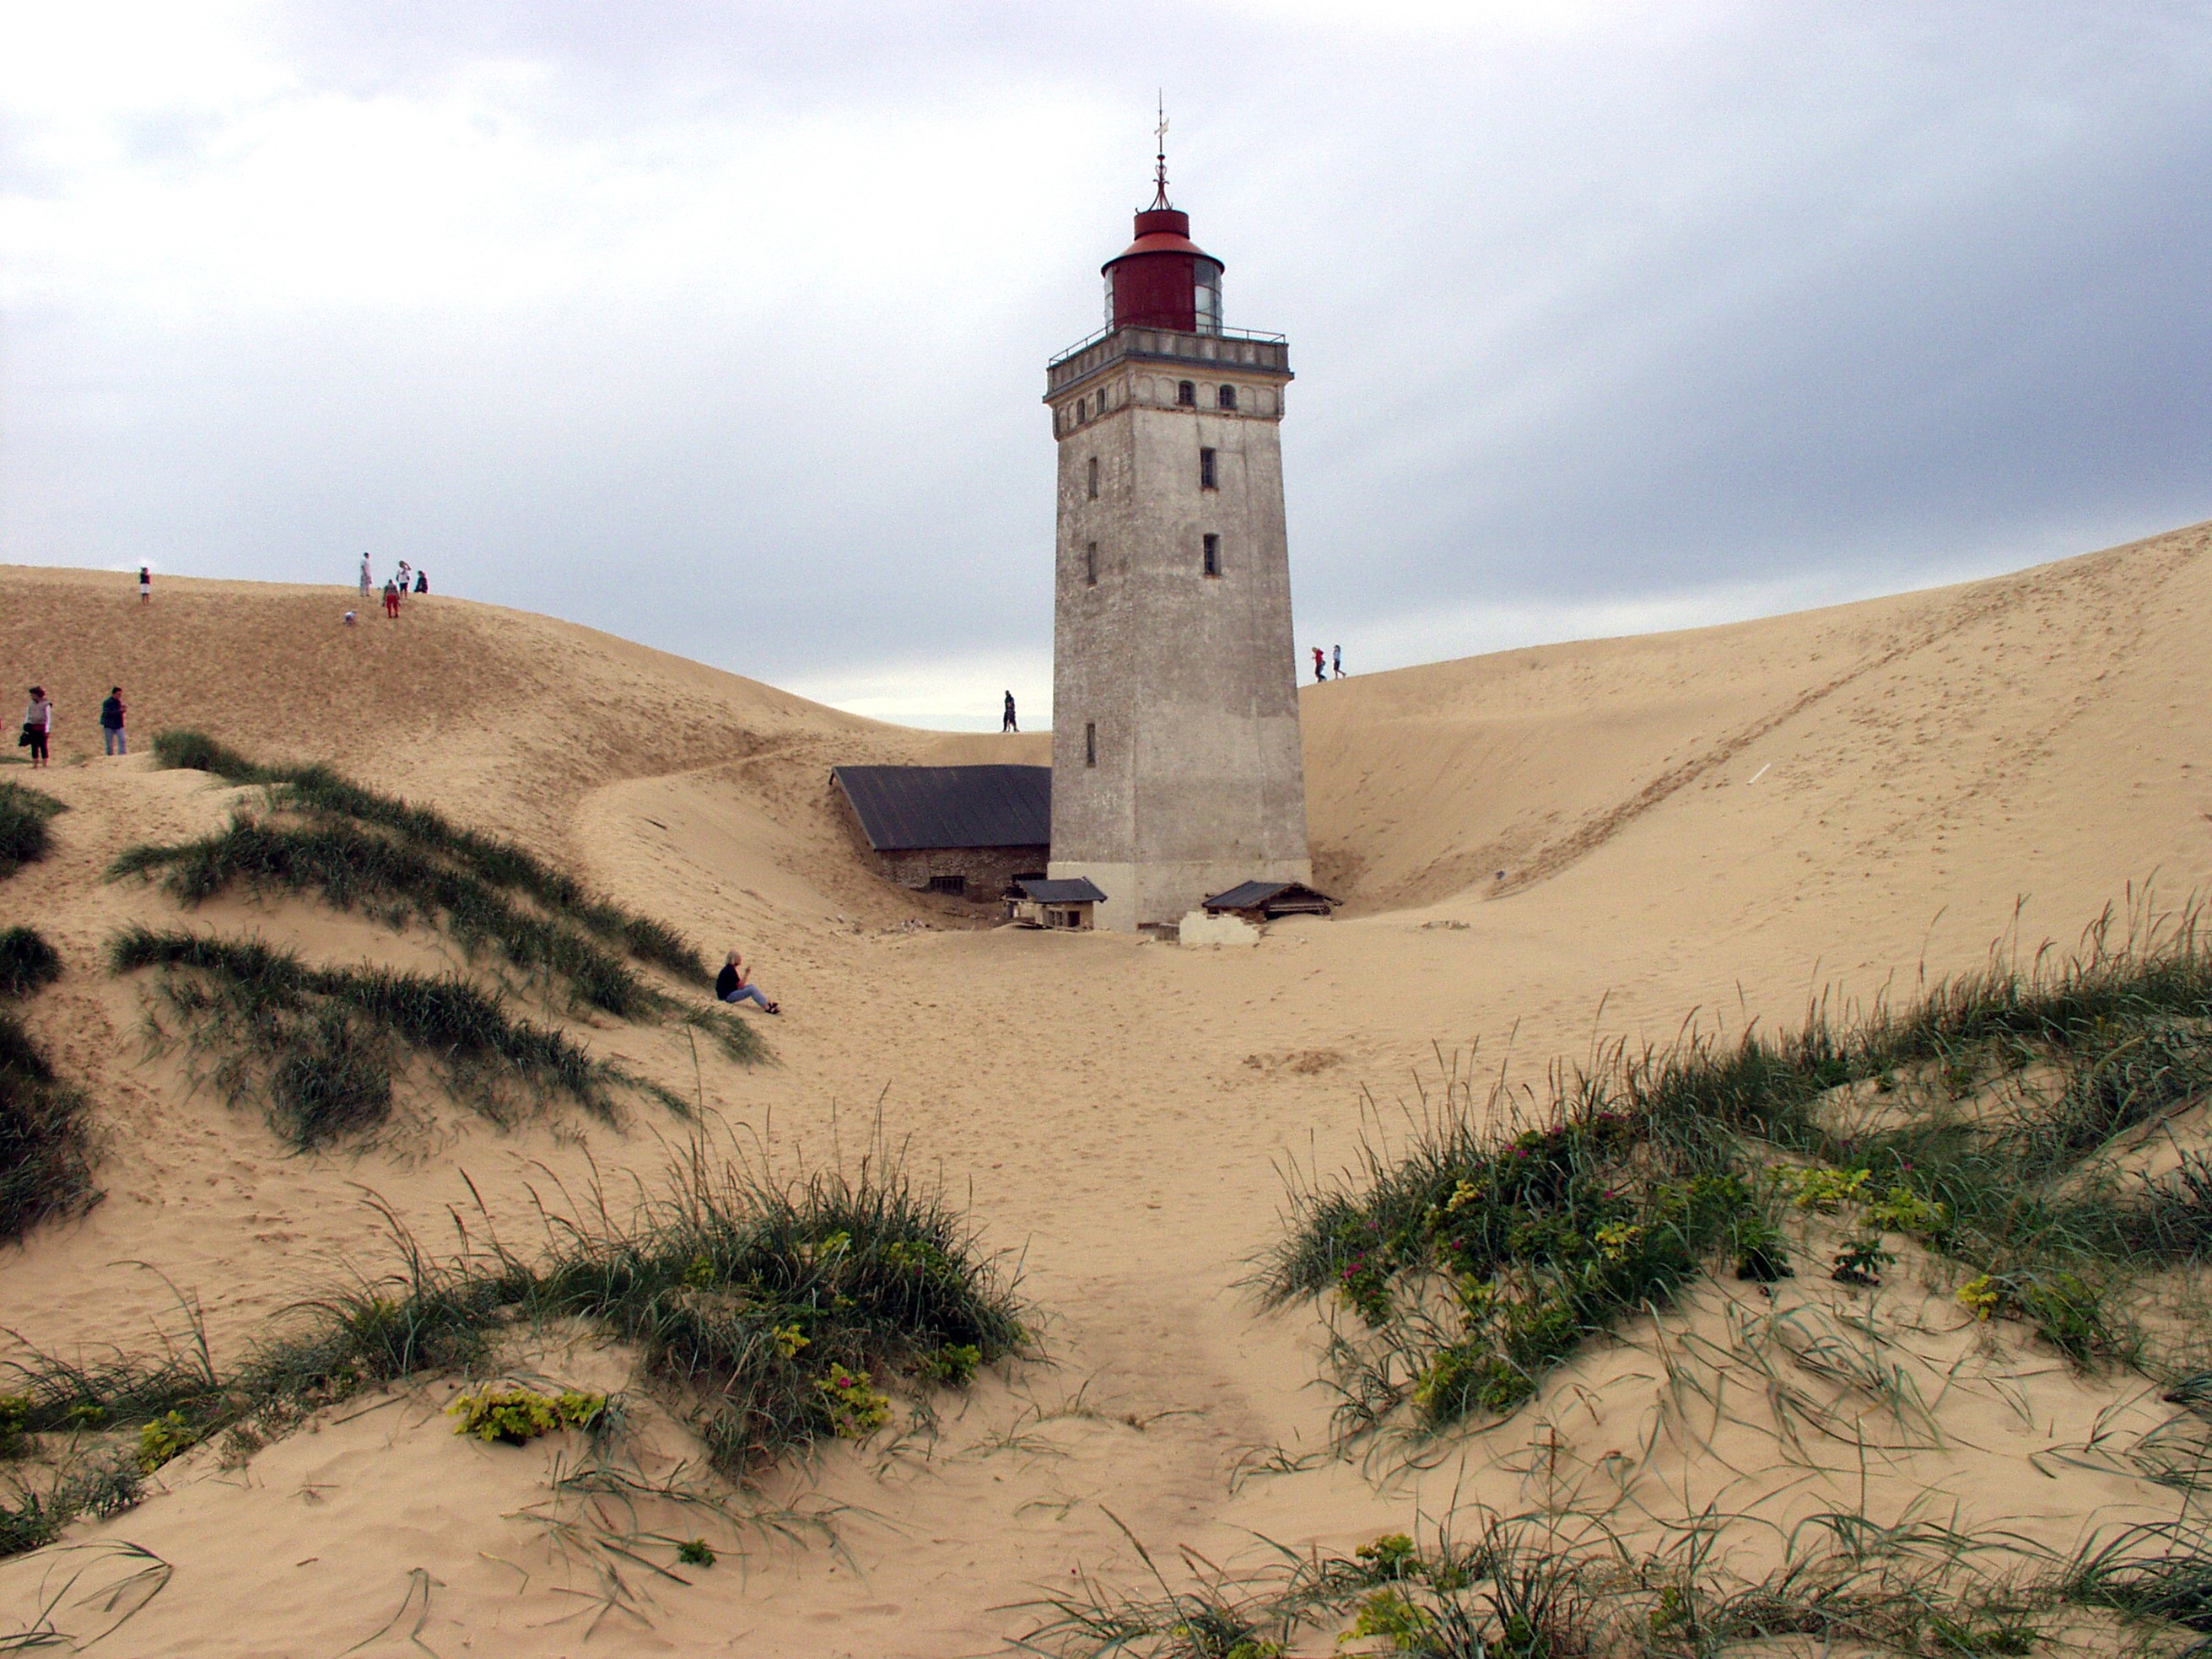 Dänemark - Kultur & Dünenlandschaften